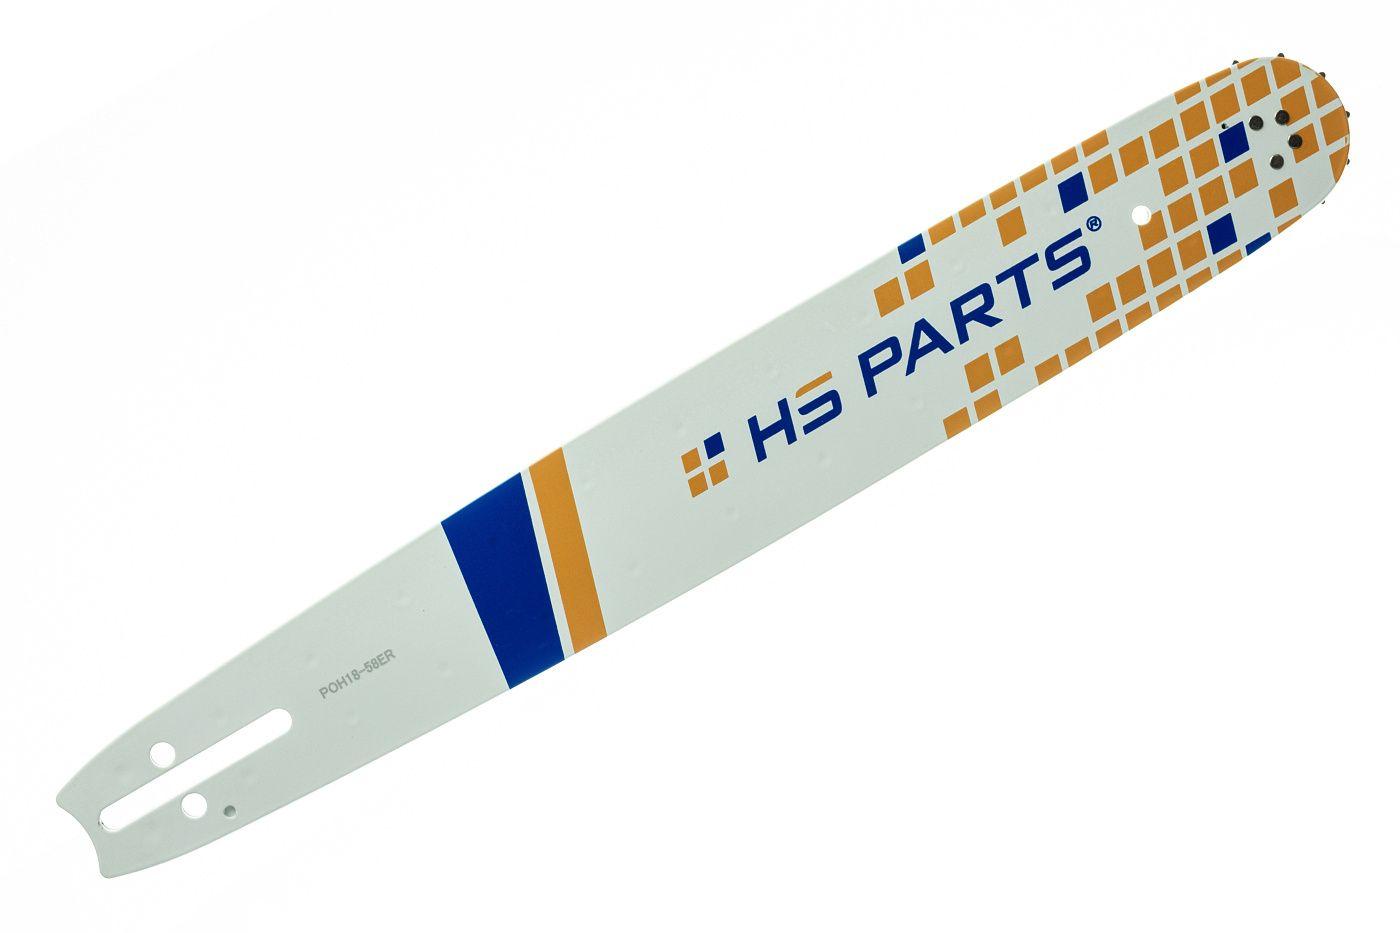 "HS PARTS Vodící lišta 18"" (45 cm) 3/8"" .058"" (1,5 mm) 68 čl."